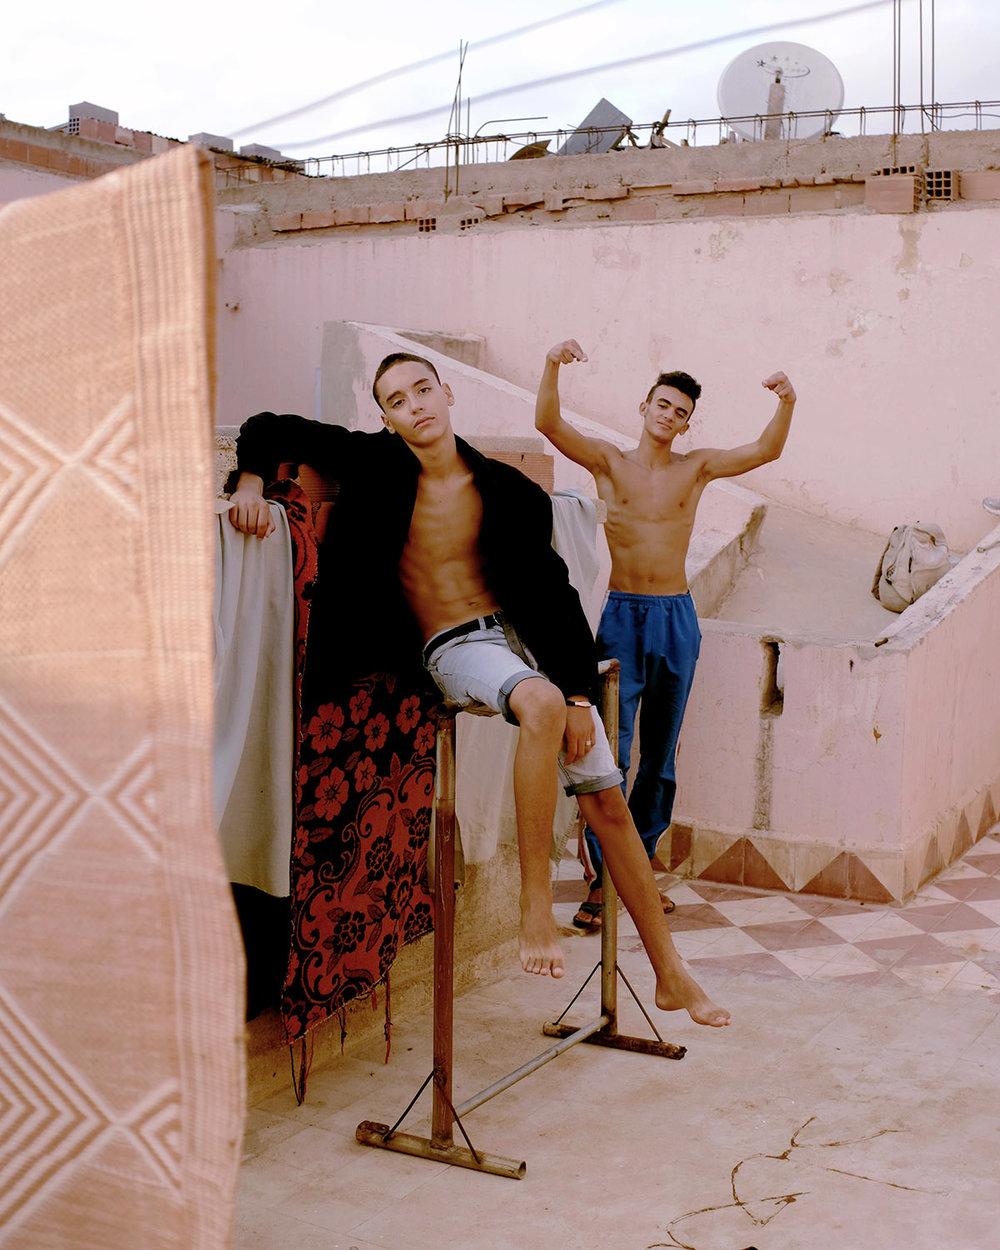 Mouad Abillat by WUL Magazine